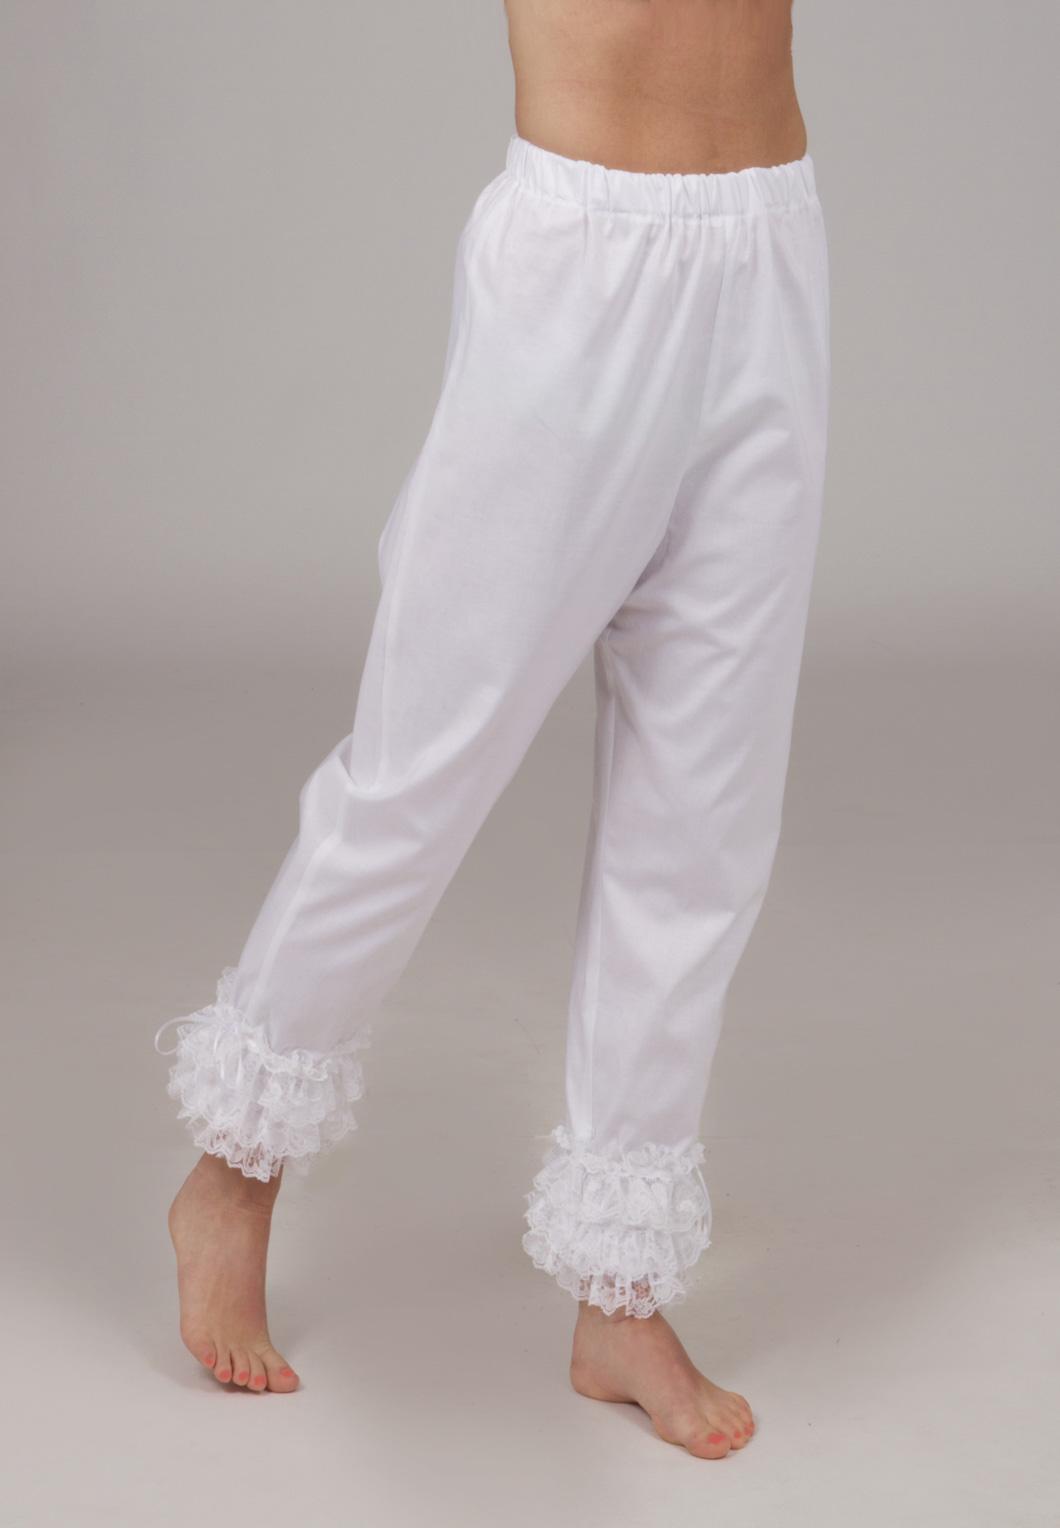 Victorian Flounced Lace Pantaloons 85690afaf